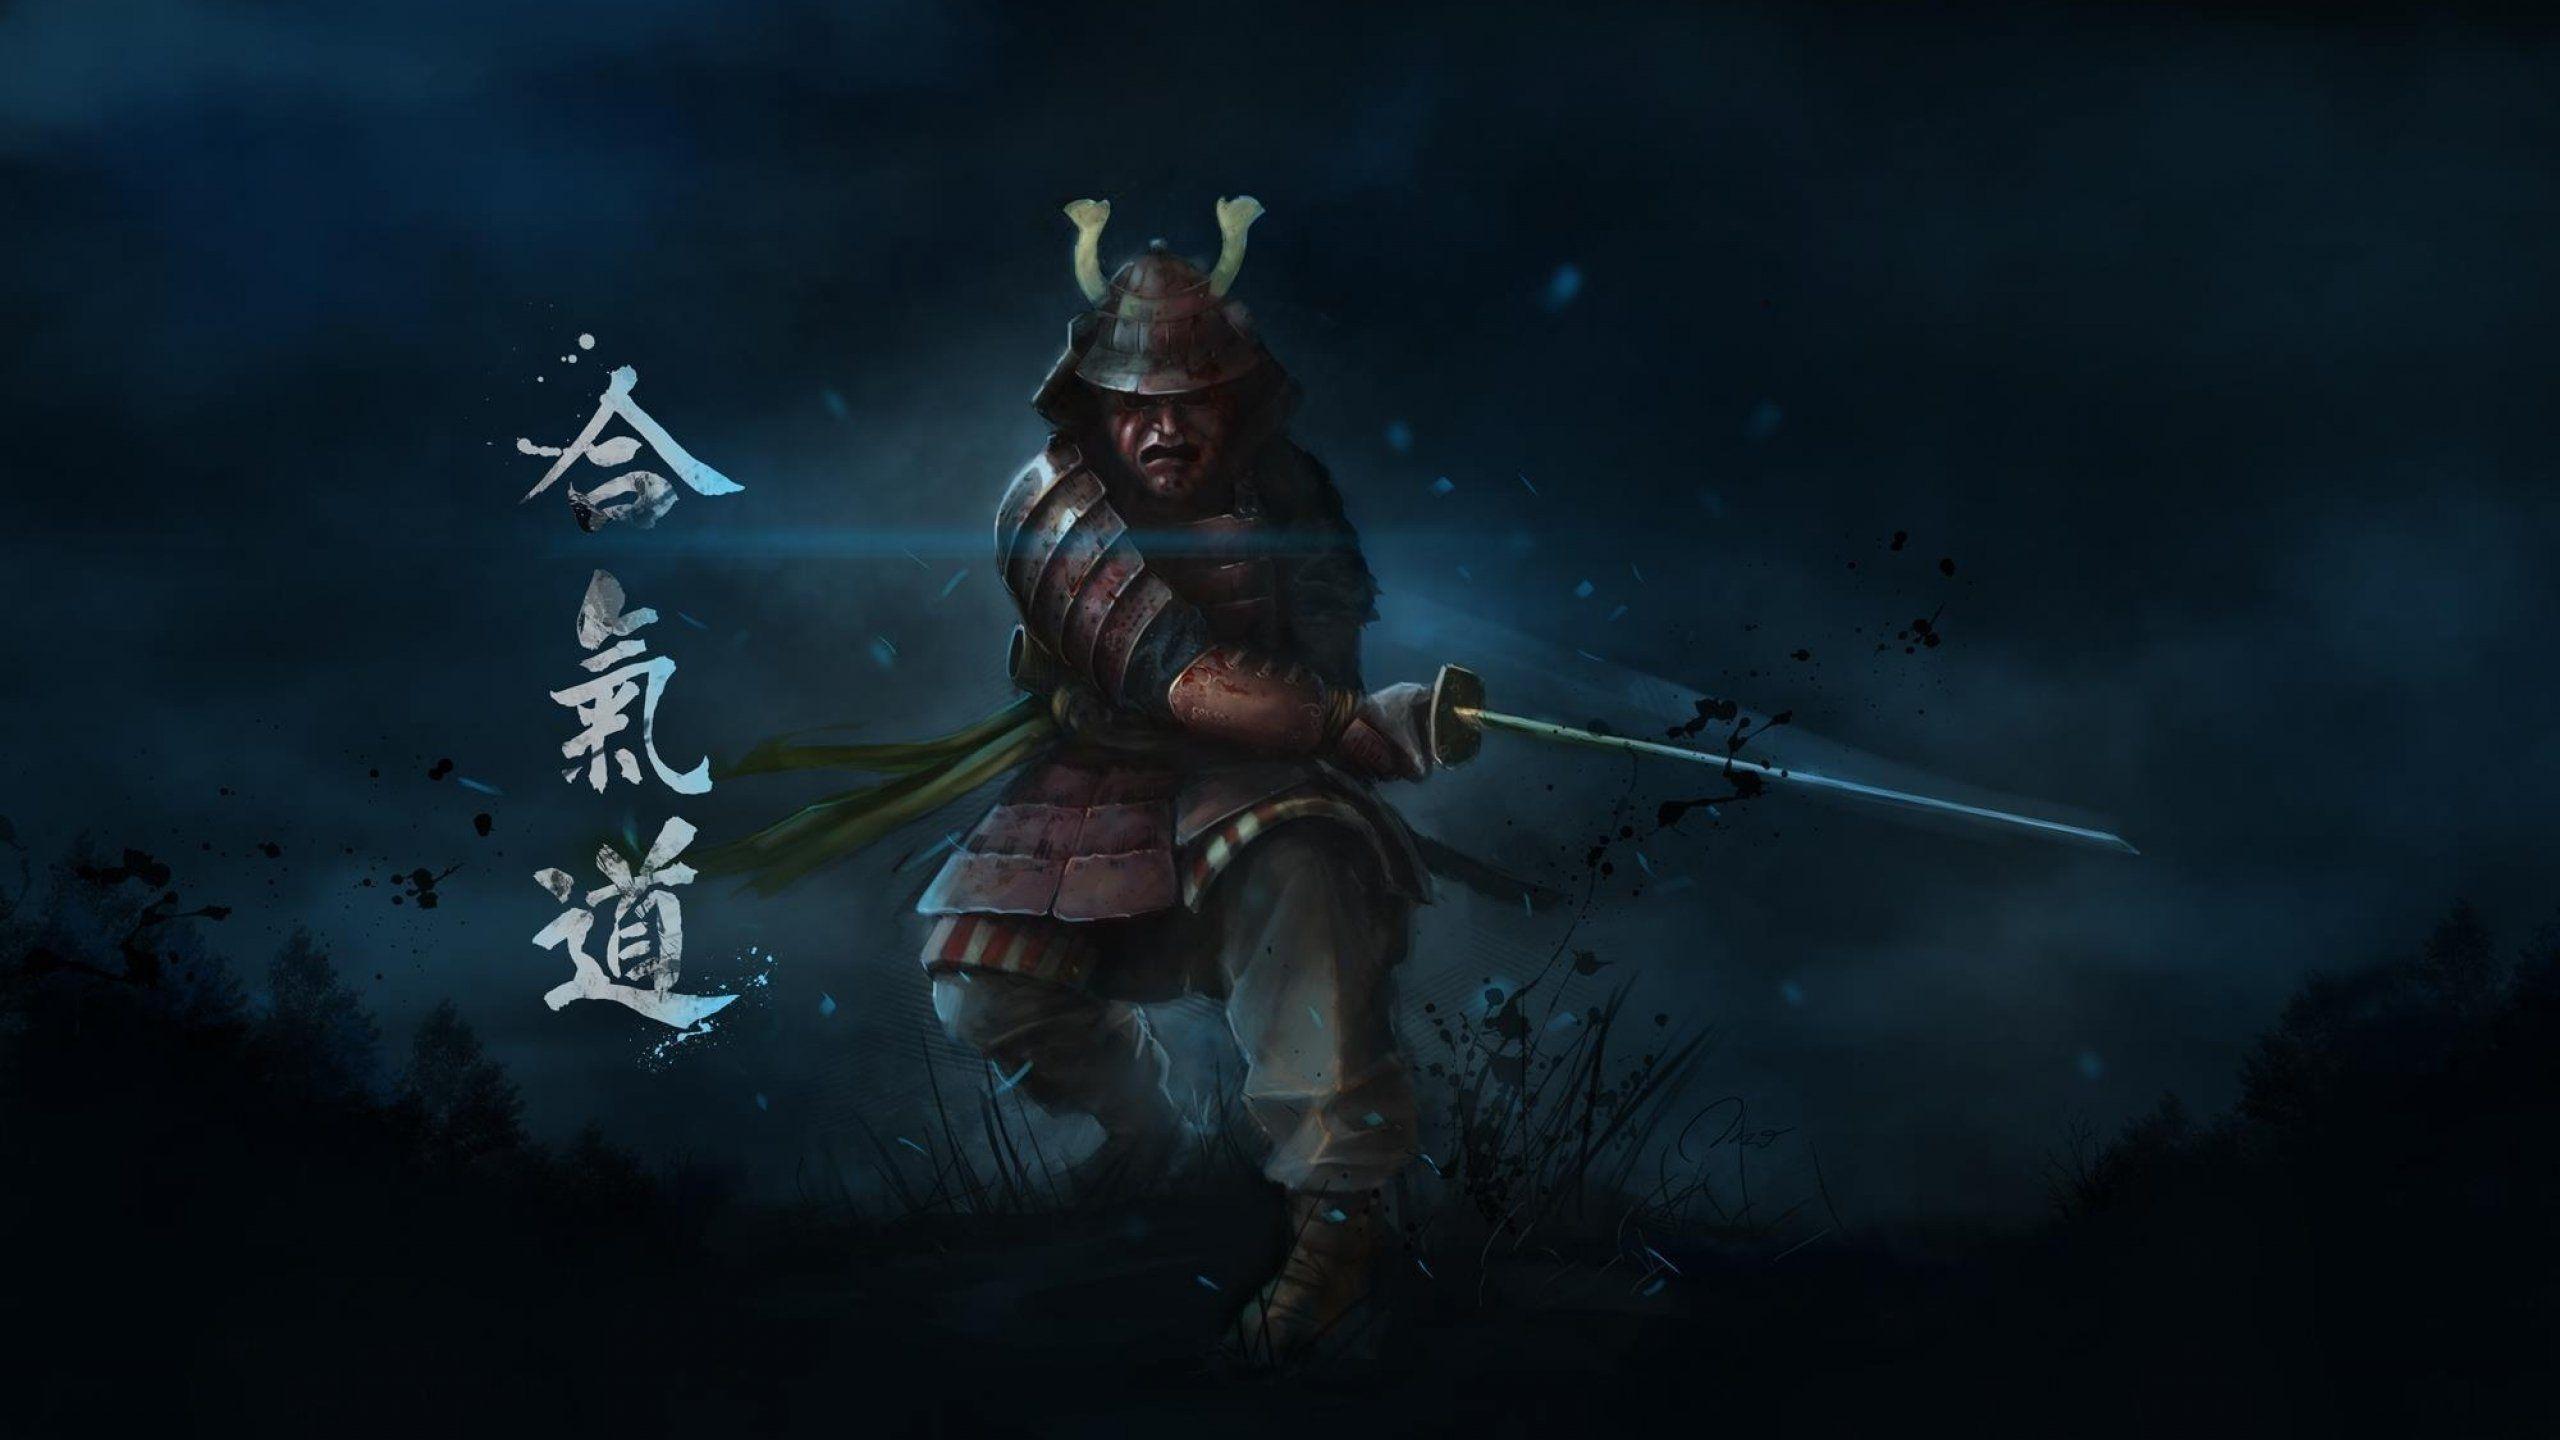 Samurai Warrior Wallpapers Top Free Samurai Warrior Backgrounds Wallpaperaccess